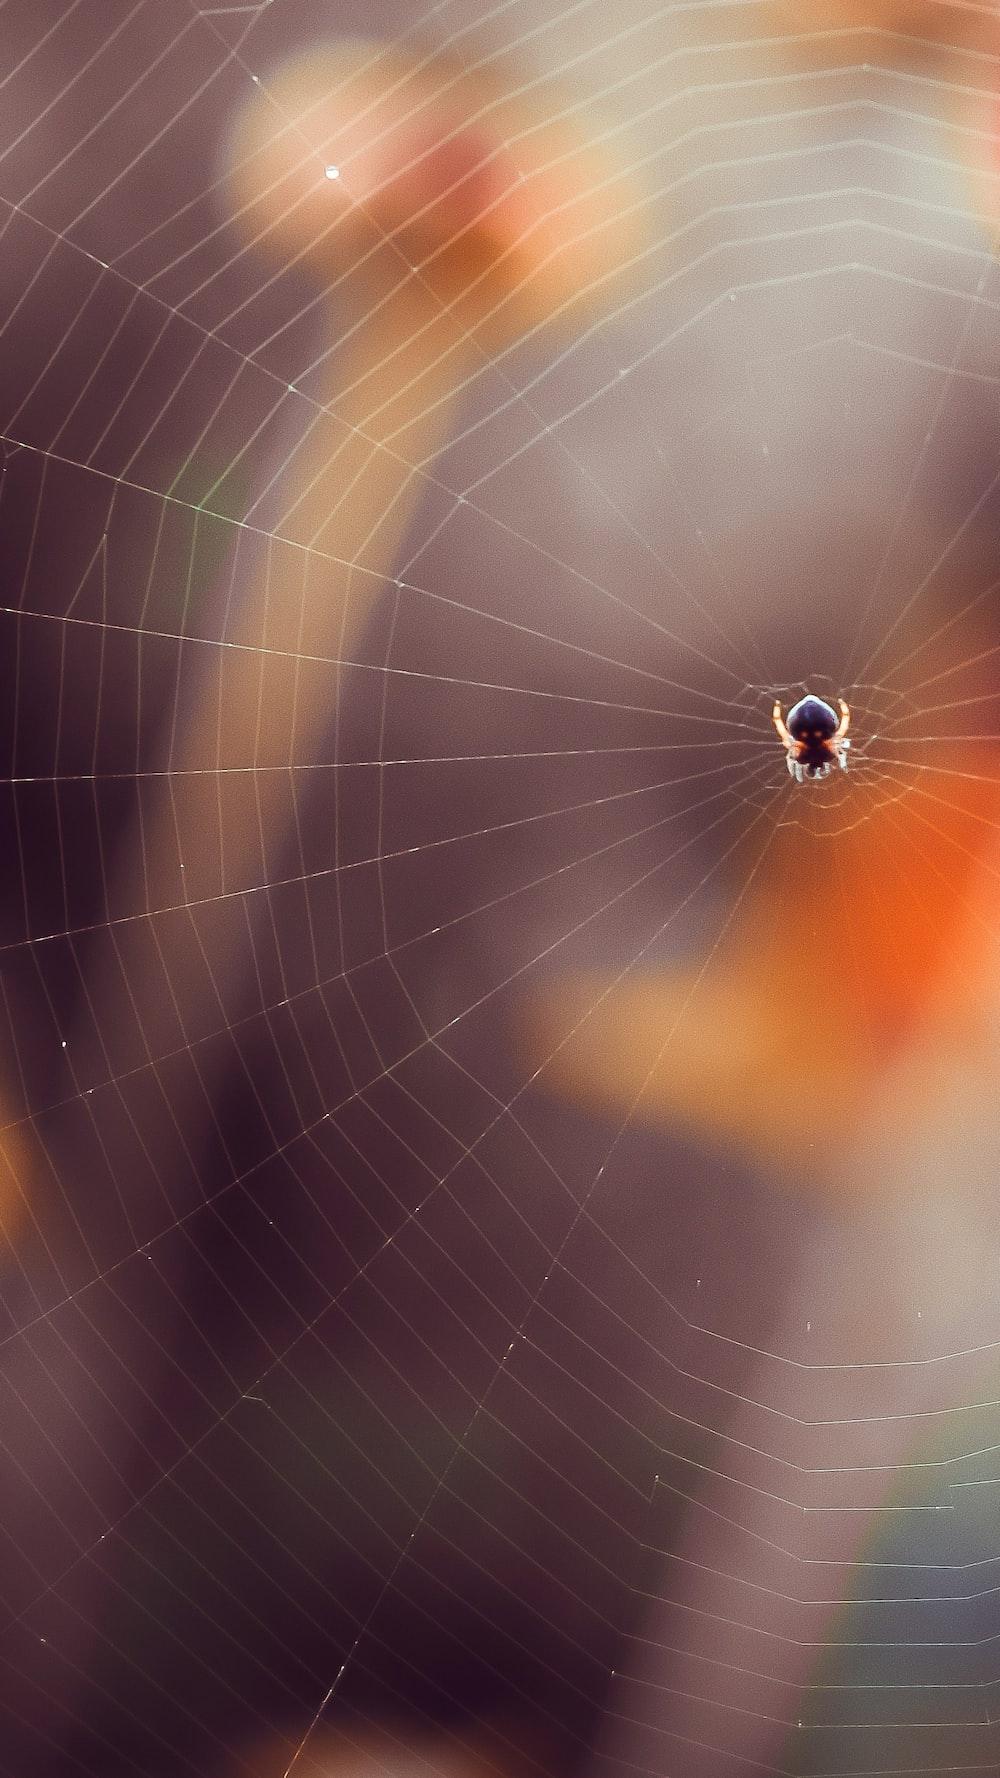 black spider on web